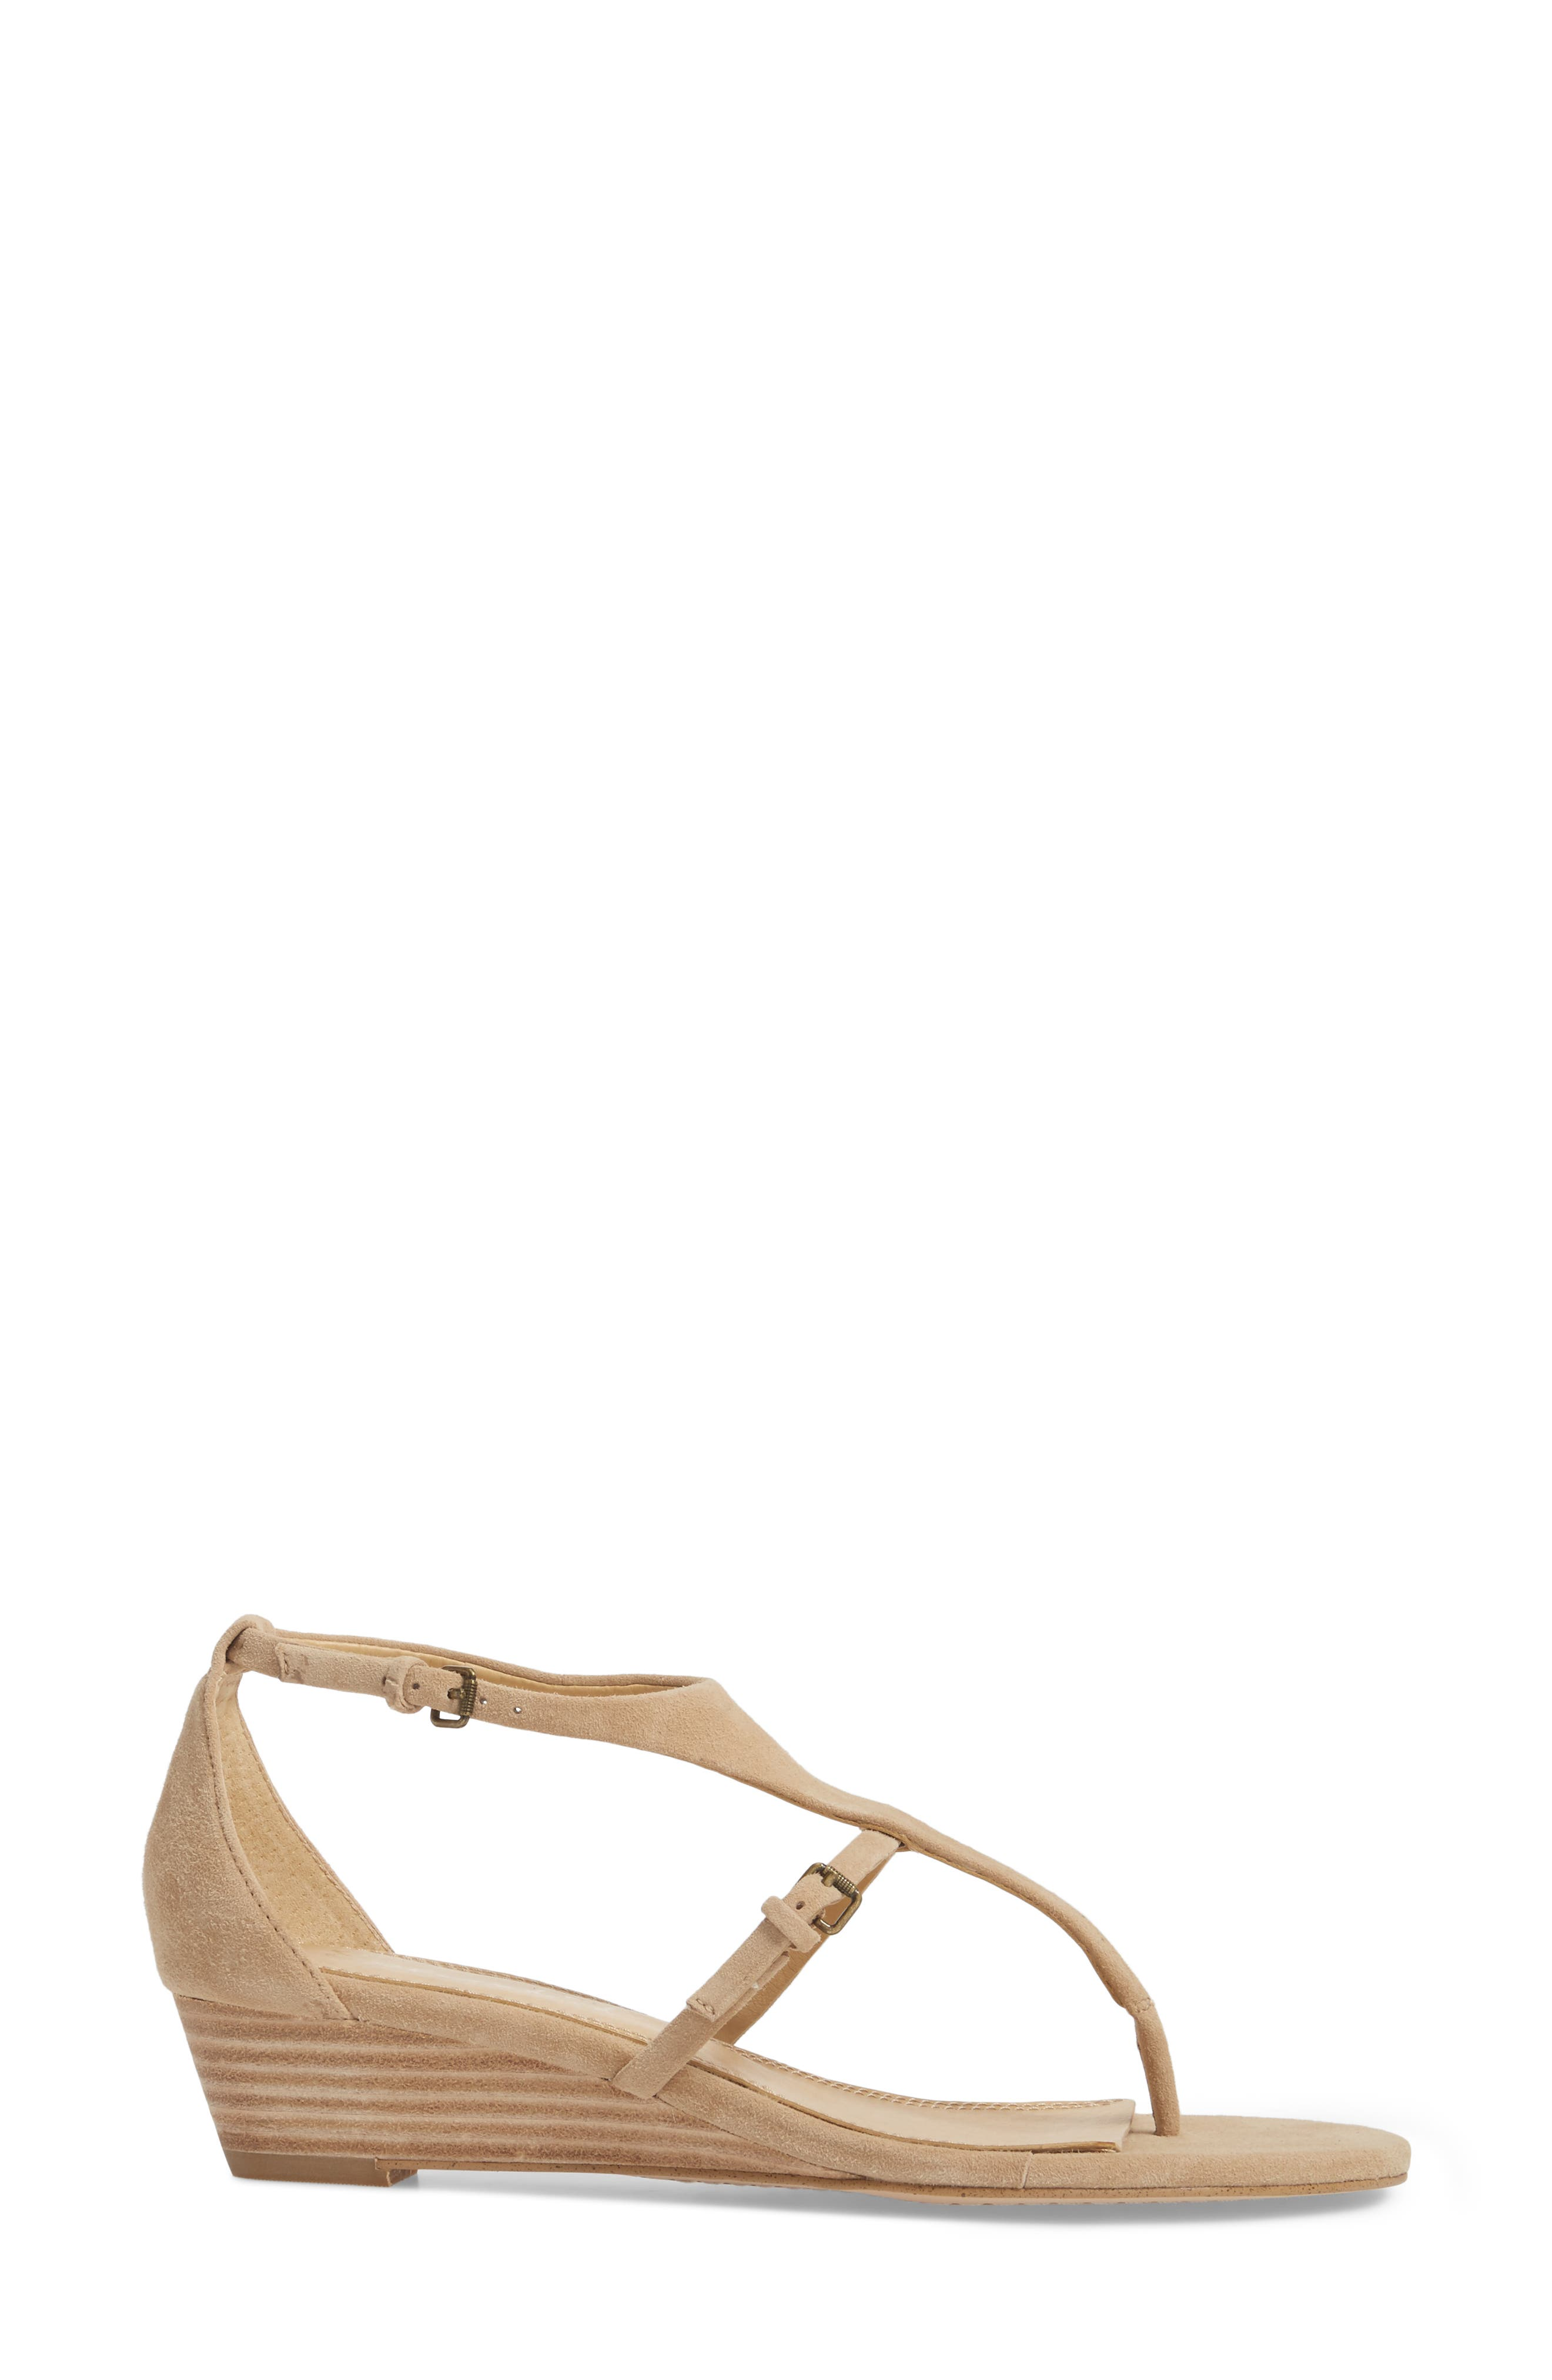 Brooklyn V-Strap Wedge Sandal,                             Alternate thumbnail 10, color,